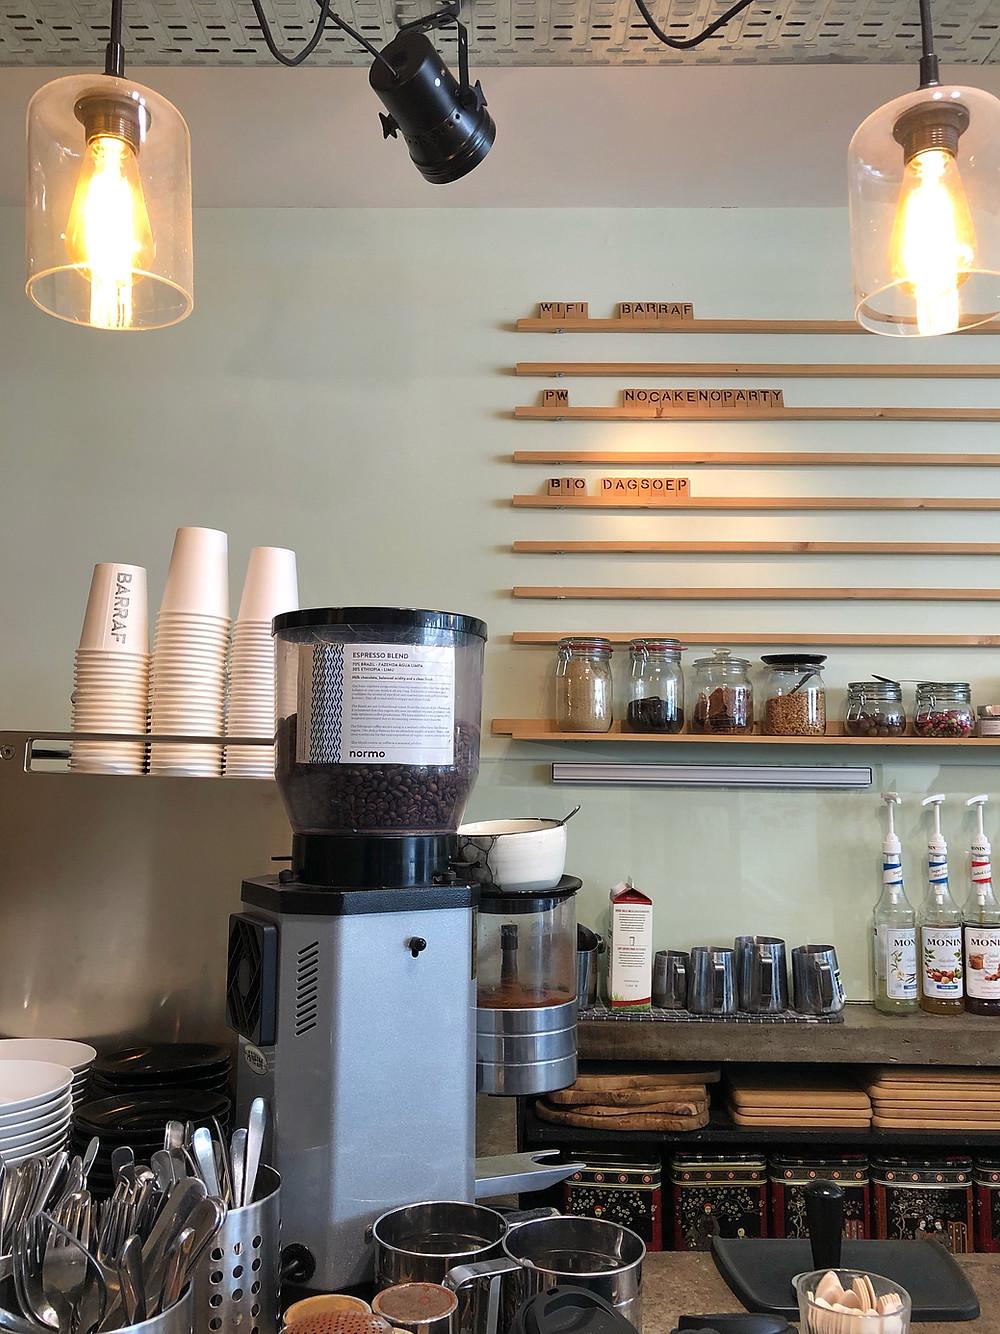 Normo Coffee at Barraf in Lier